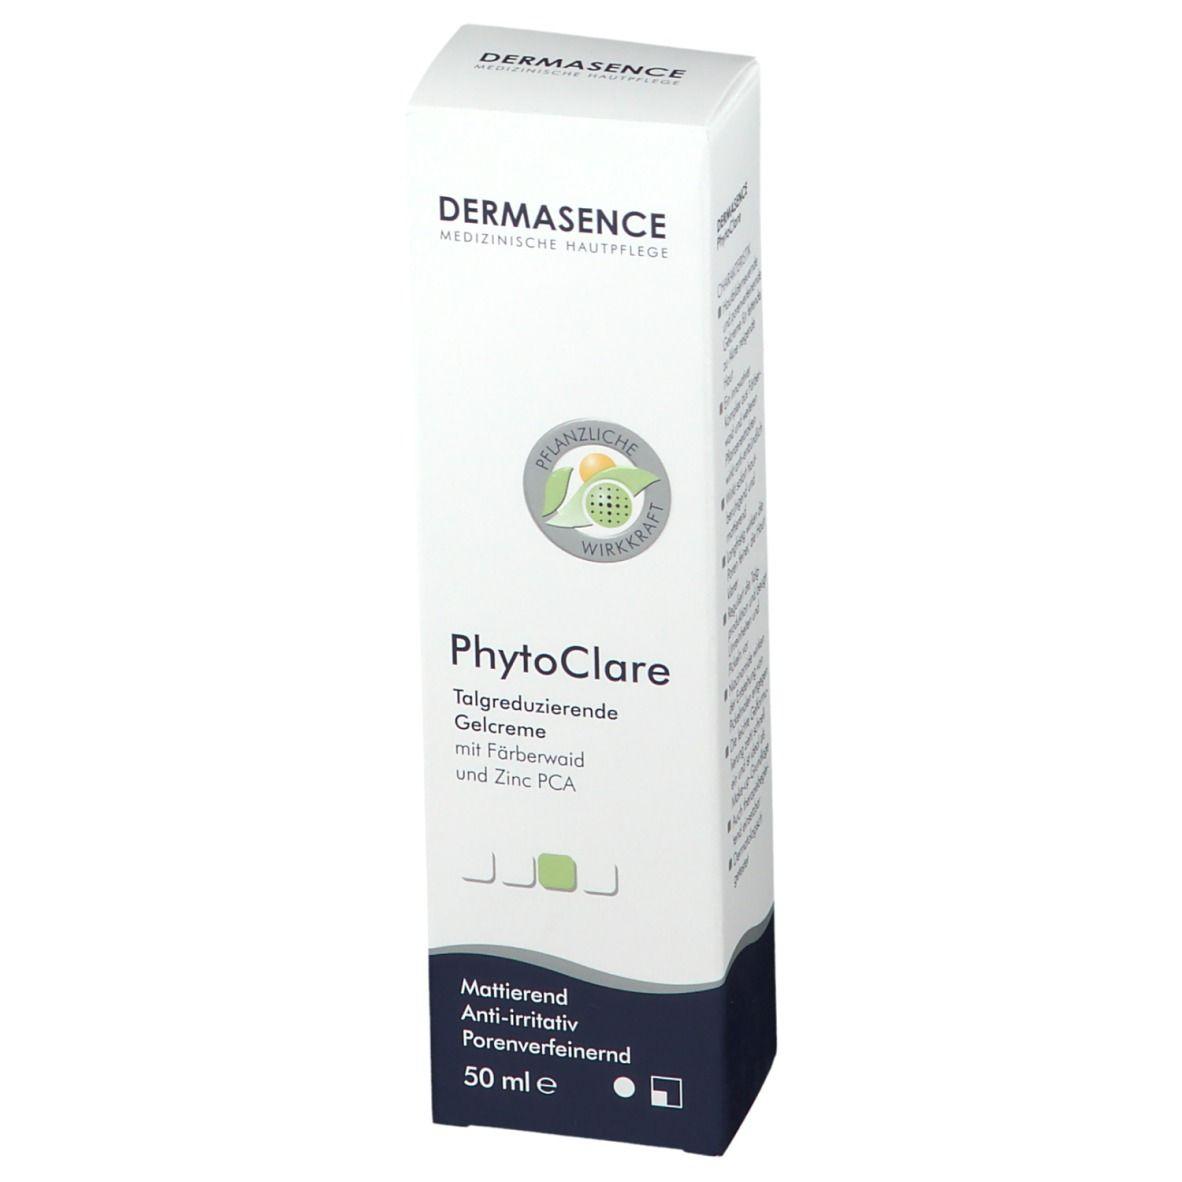 DERMASENCE PhytoClare